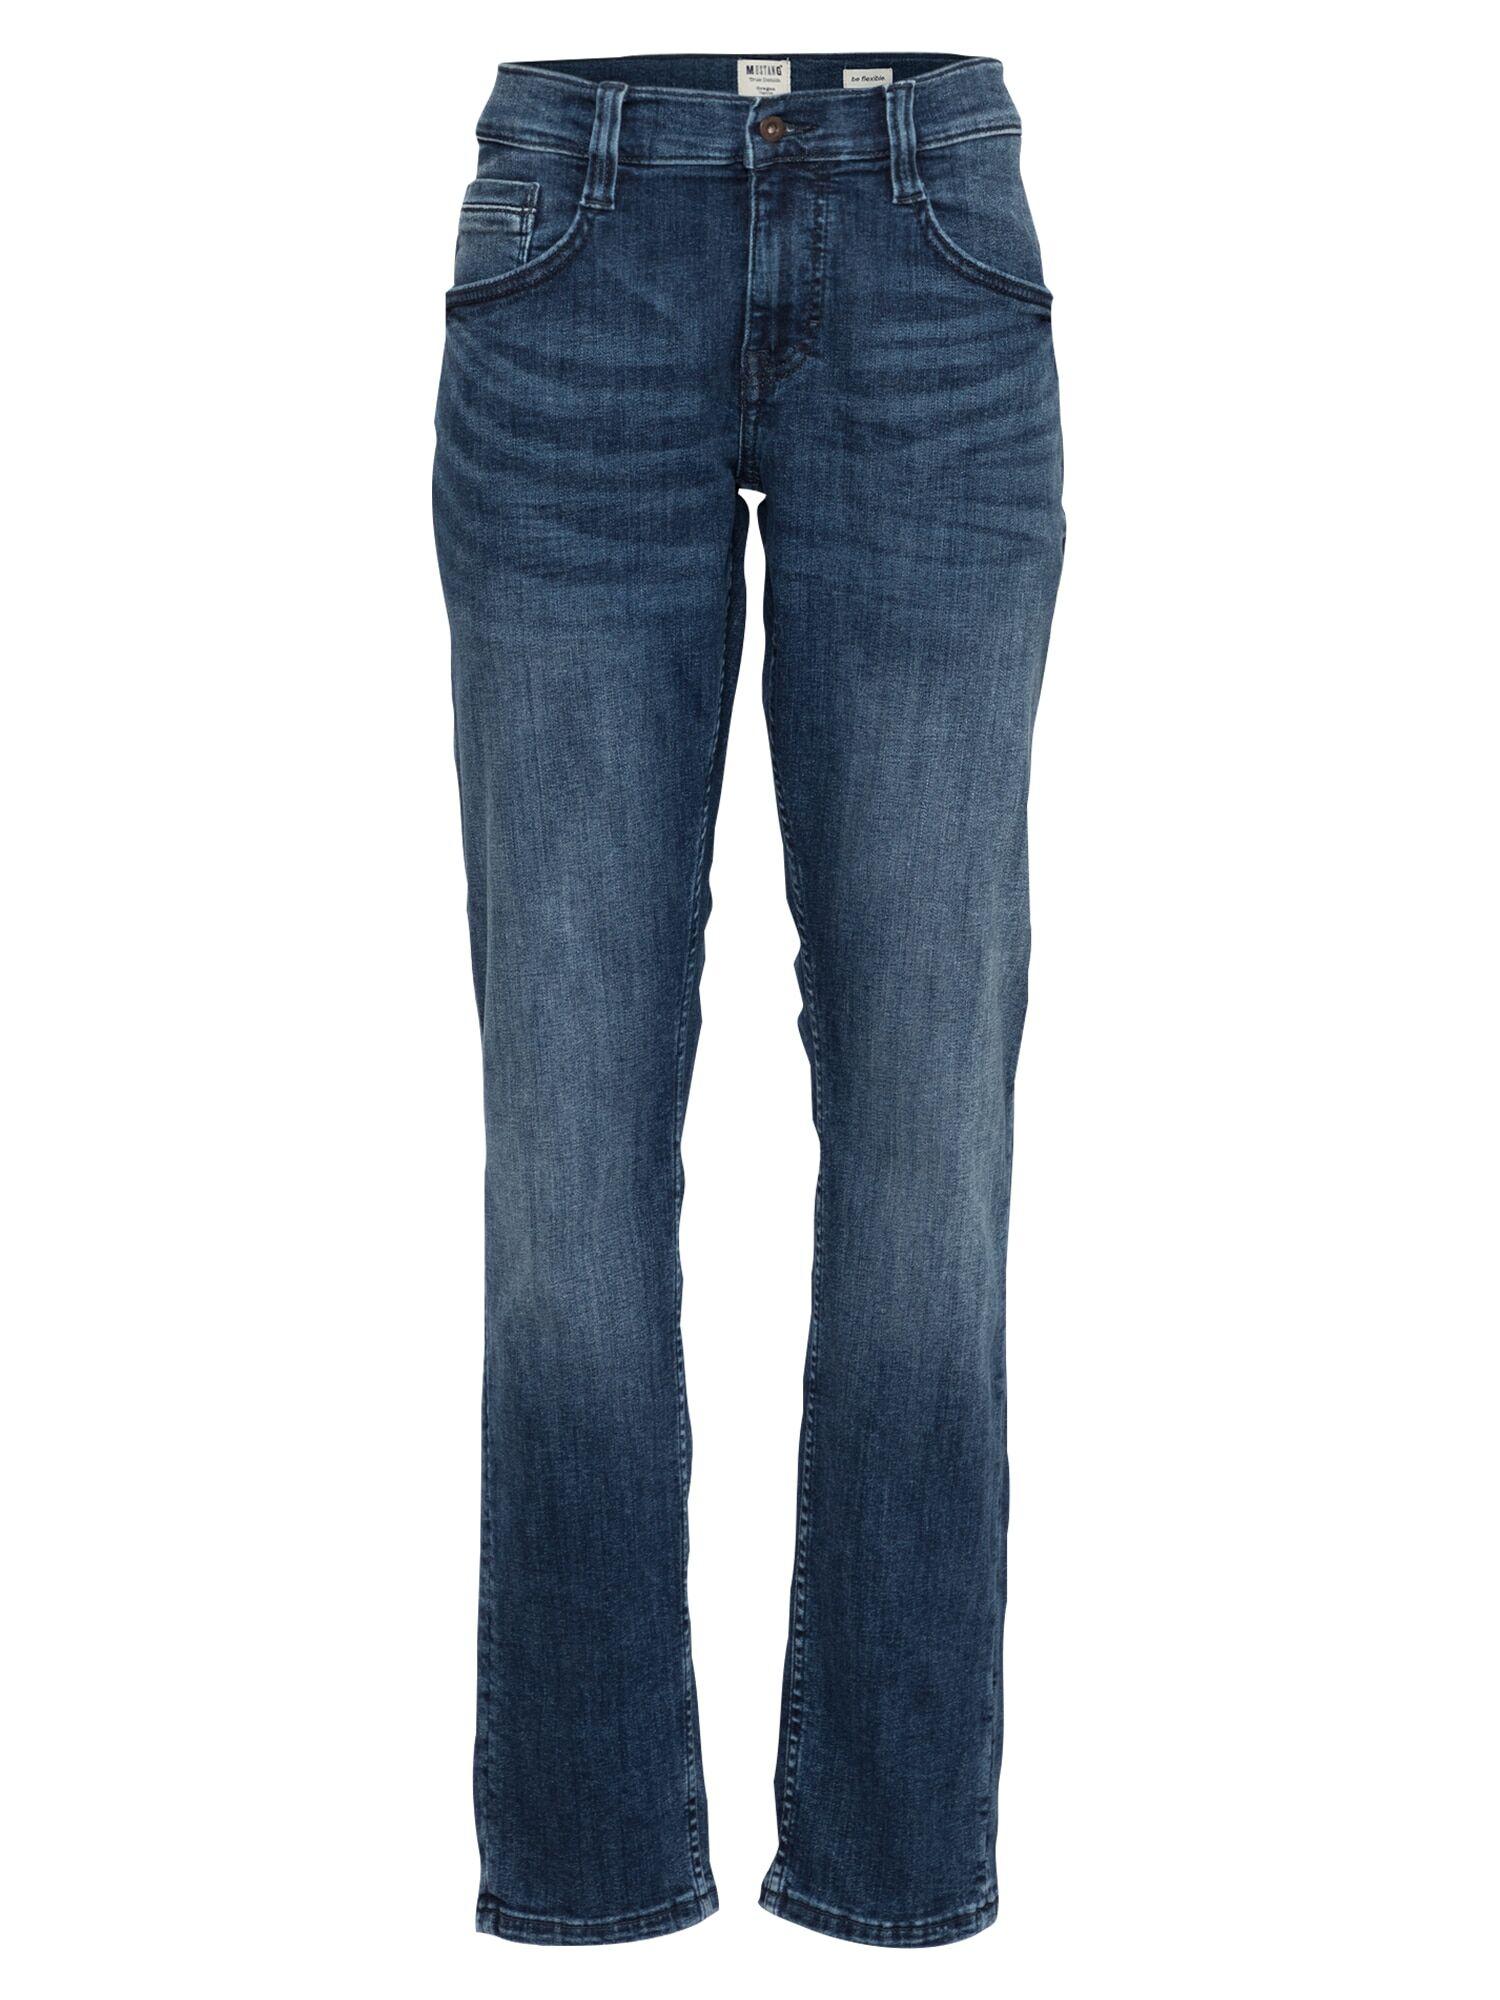 MUSTANG Jean 'Oregon'  - Bleu - Taille: 36/32 - male